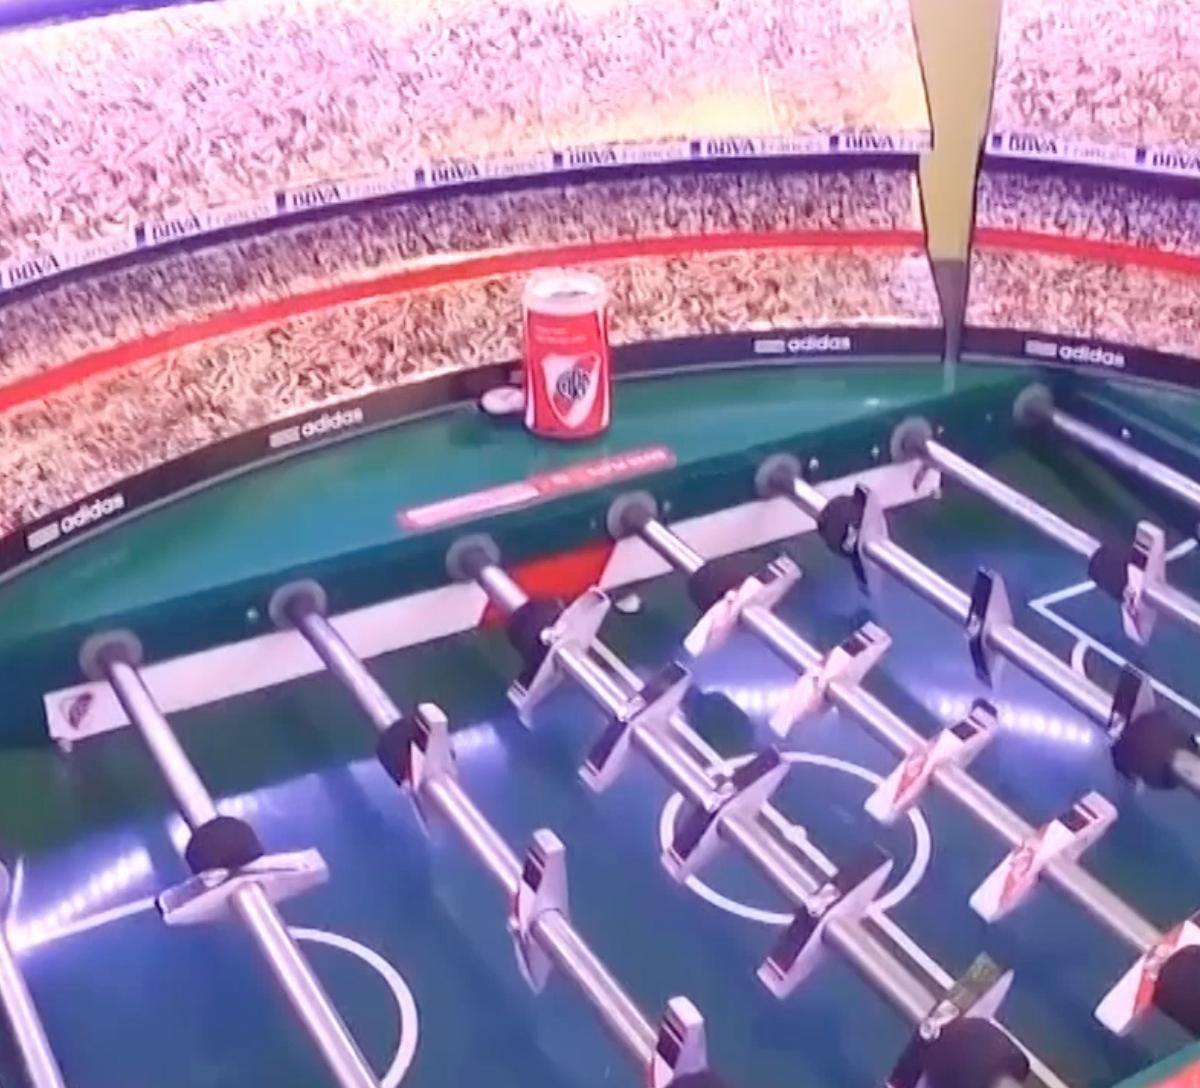 Custom Foosball Tables Logo Foosball Table Customfoosballtable Logofoosballtable Handcraftedfoosballtable Per Soccer Table Foosball Tables Foosball Table